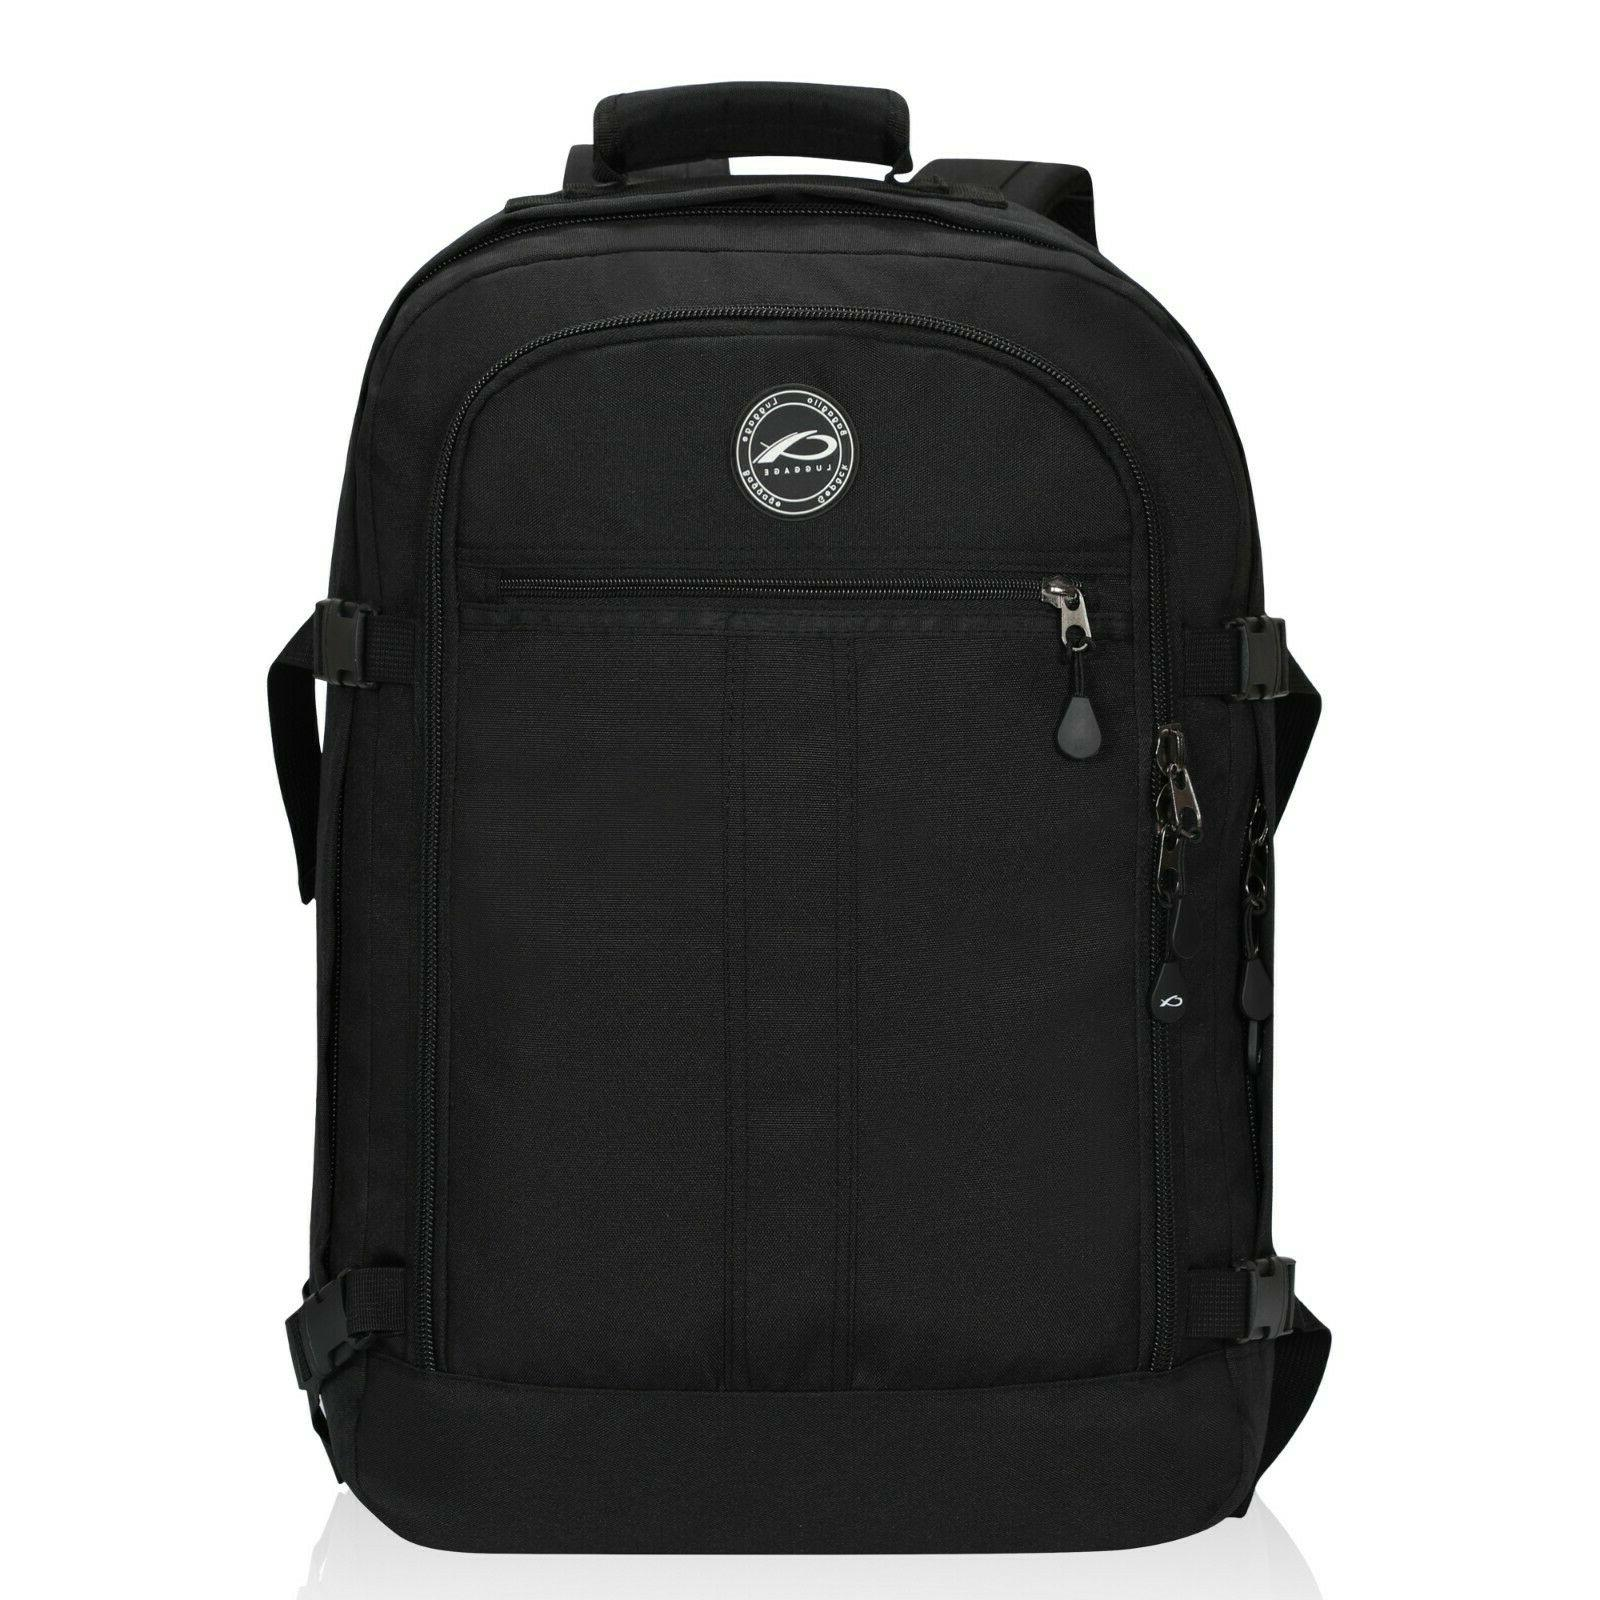 35L Carry on Backpack Luggage Travel Weekender Backpack Flig